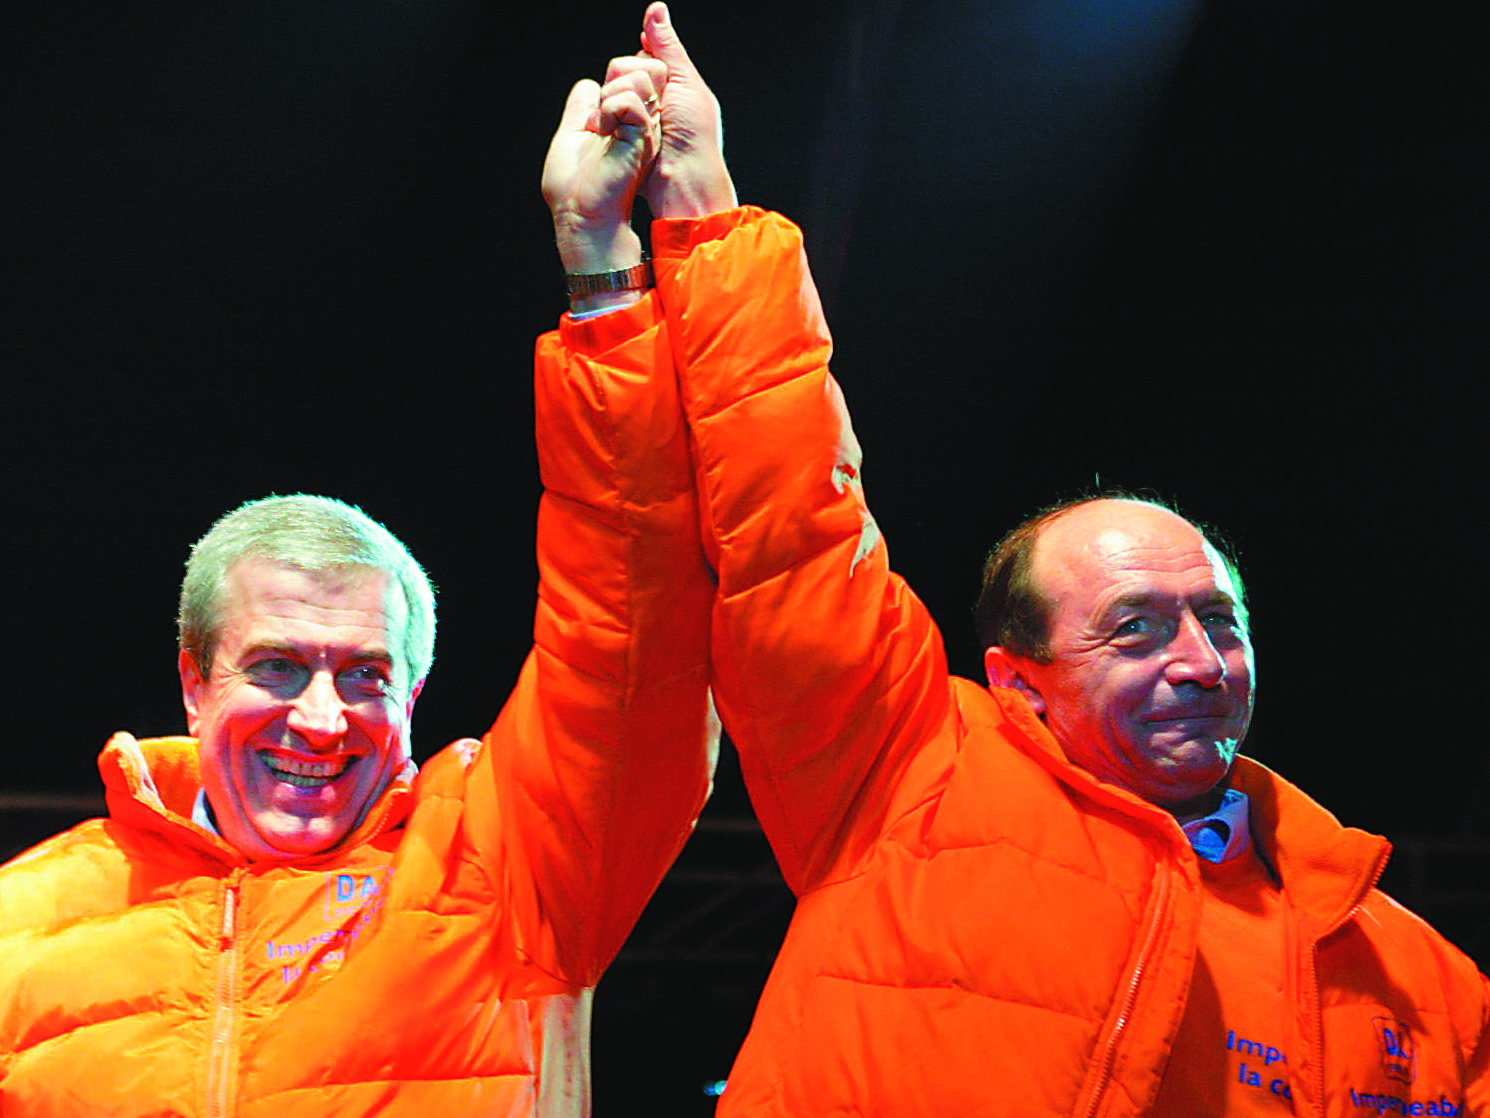 ROMANIA-ELECTIONS-BASESCU CELEBRATION